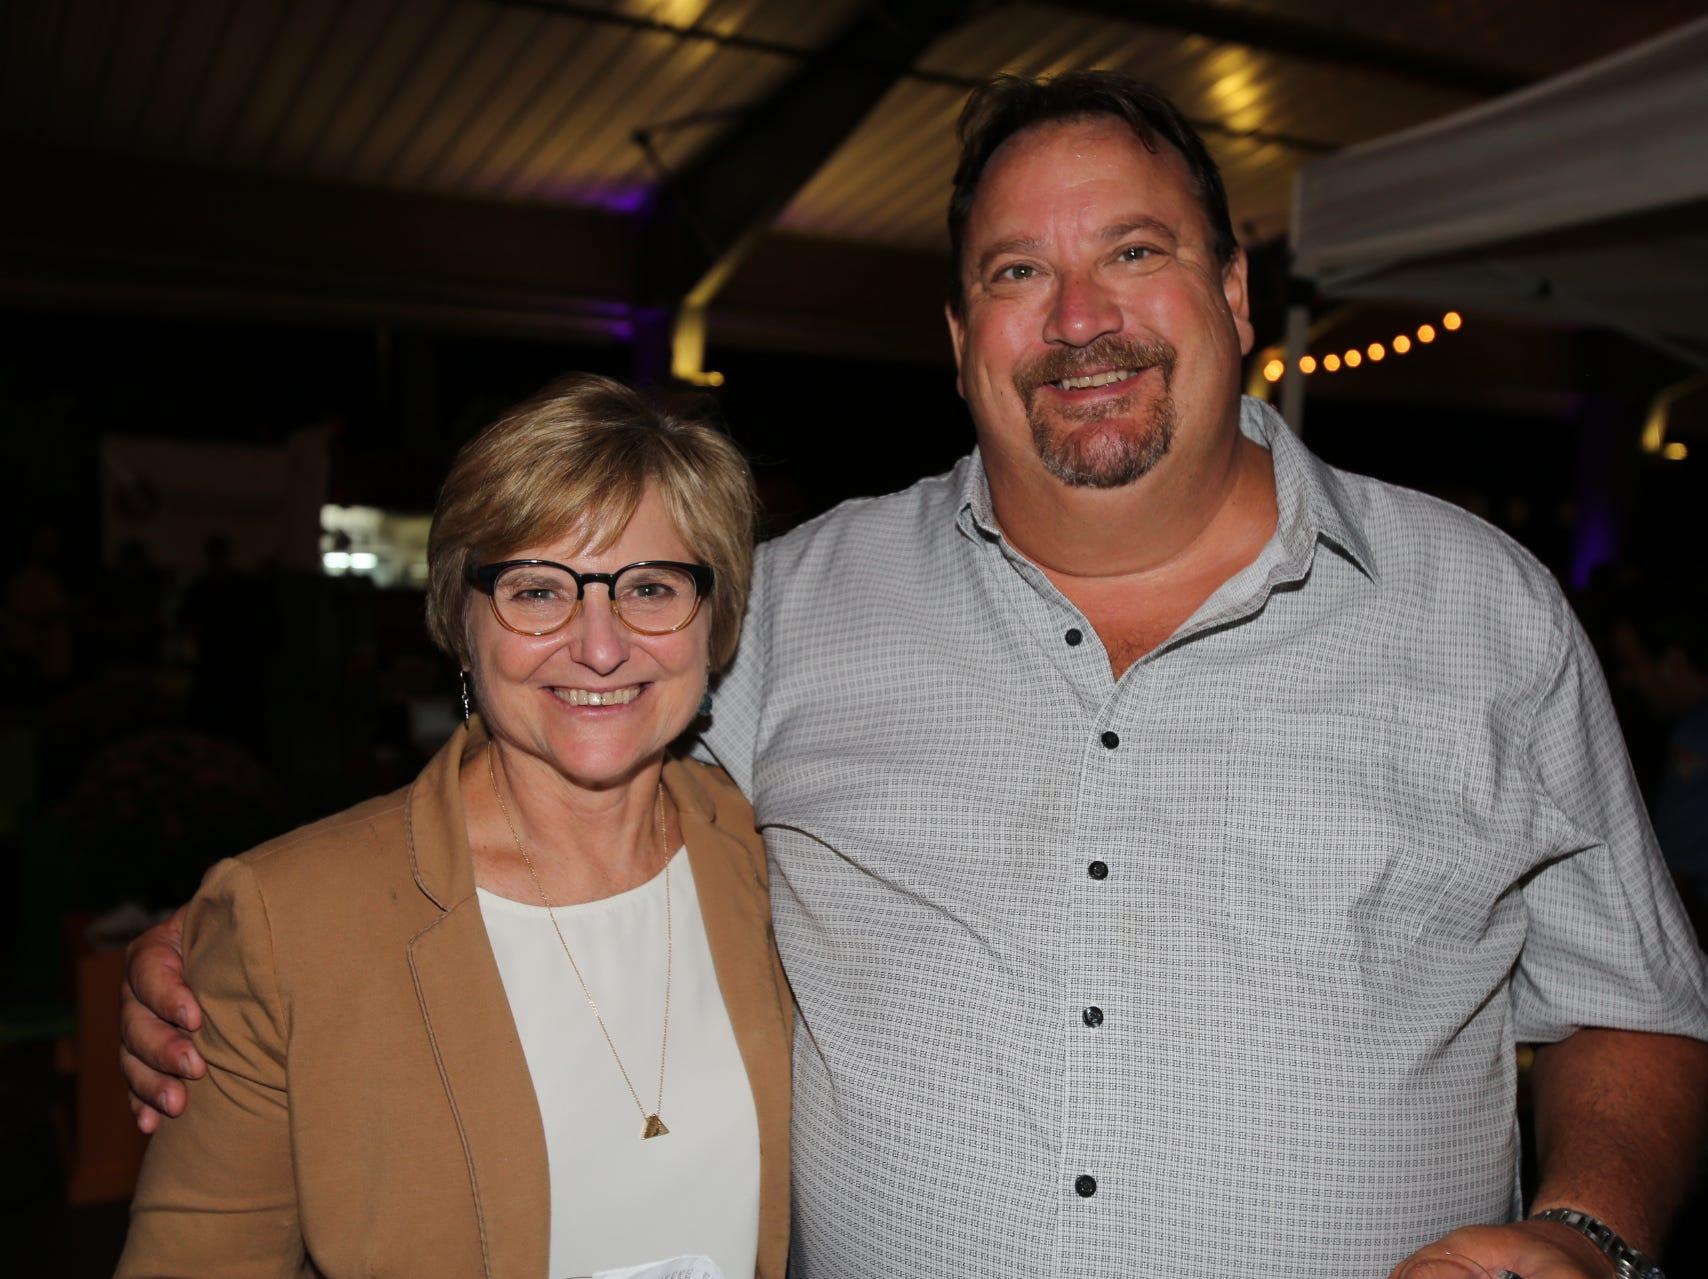 Judy Hadsall and John Widiger